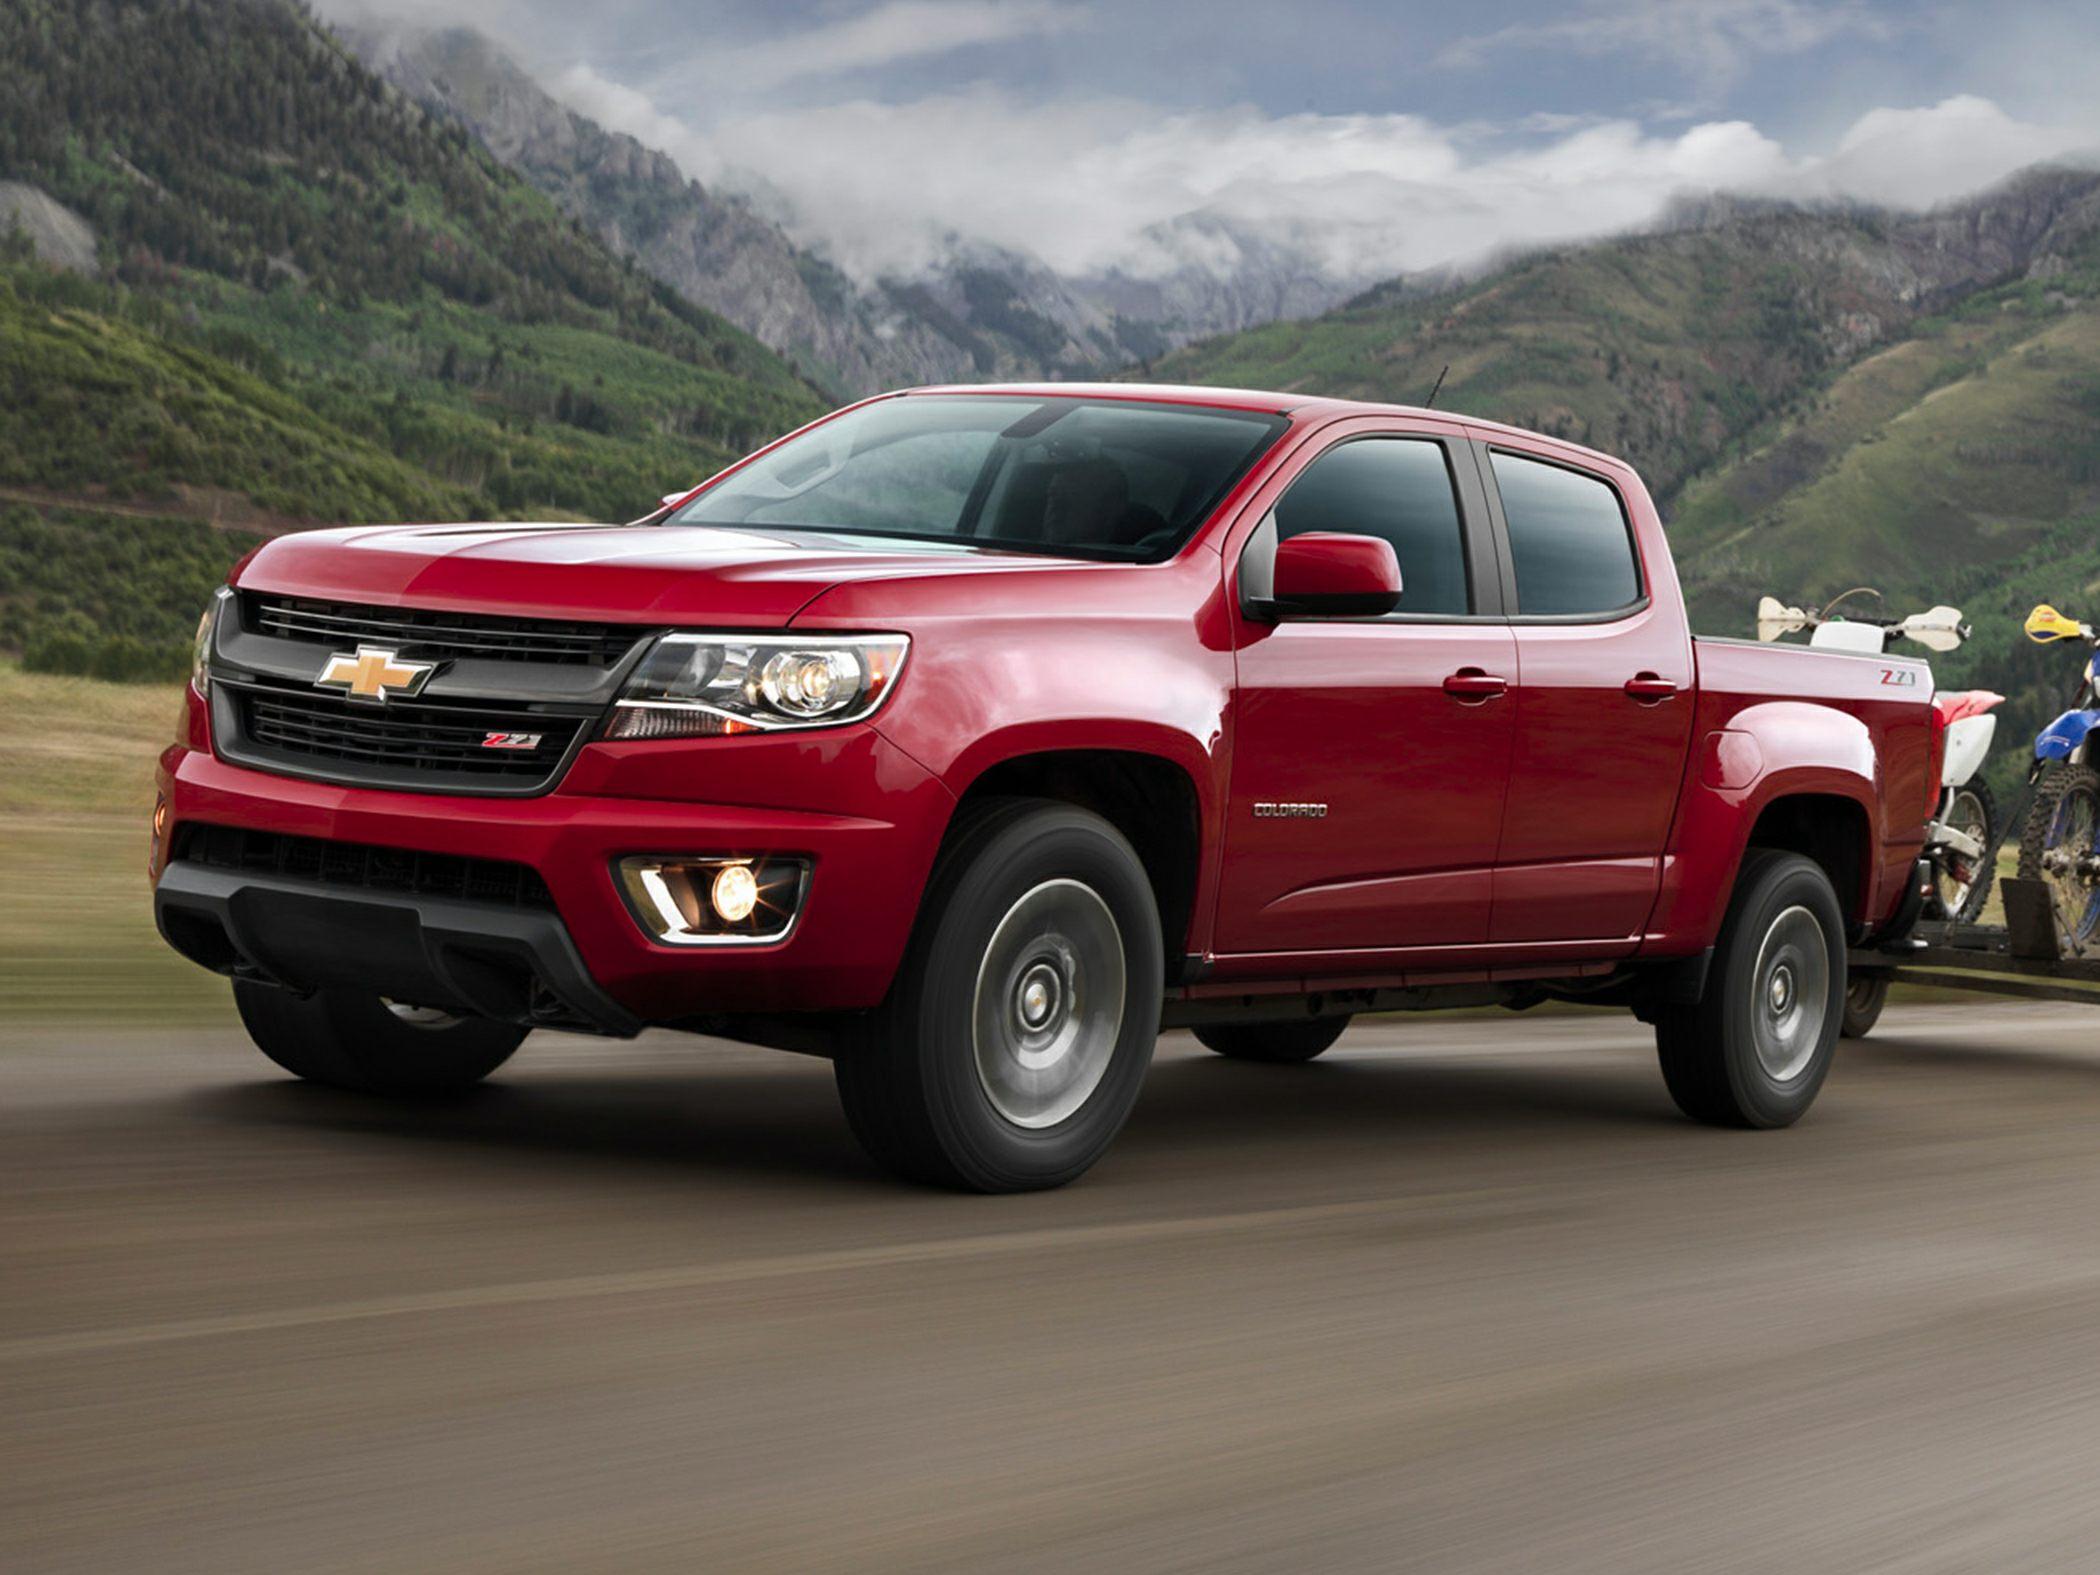 4x4 truck lease deals